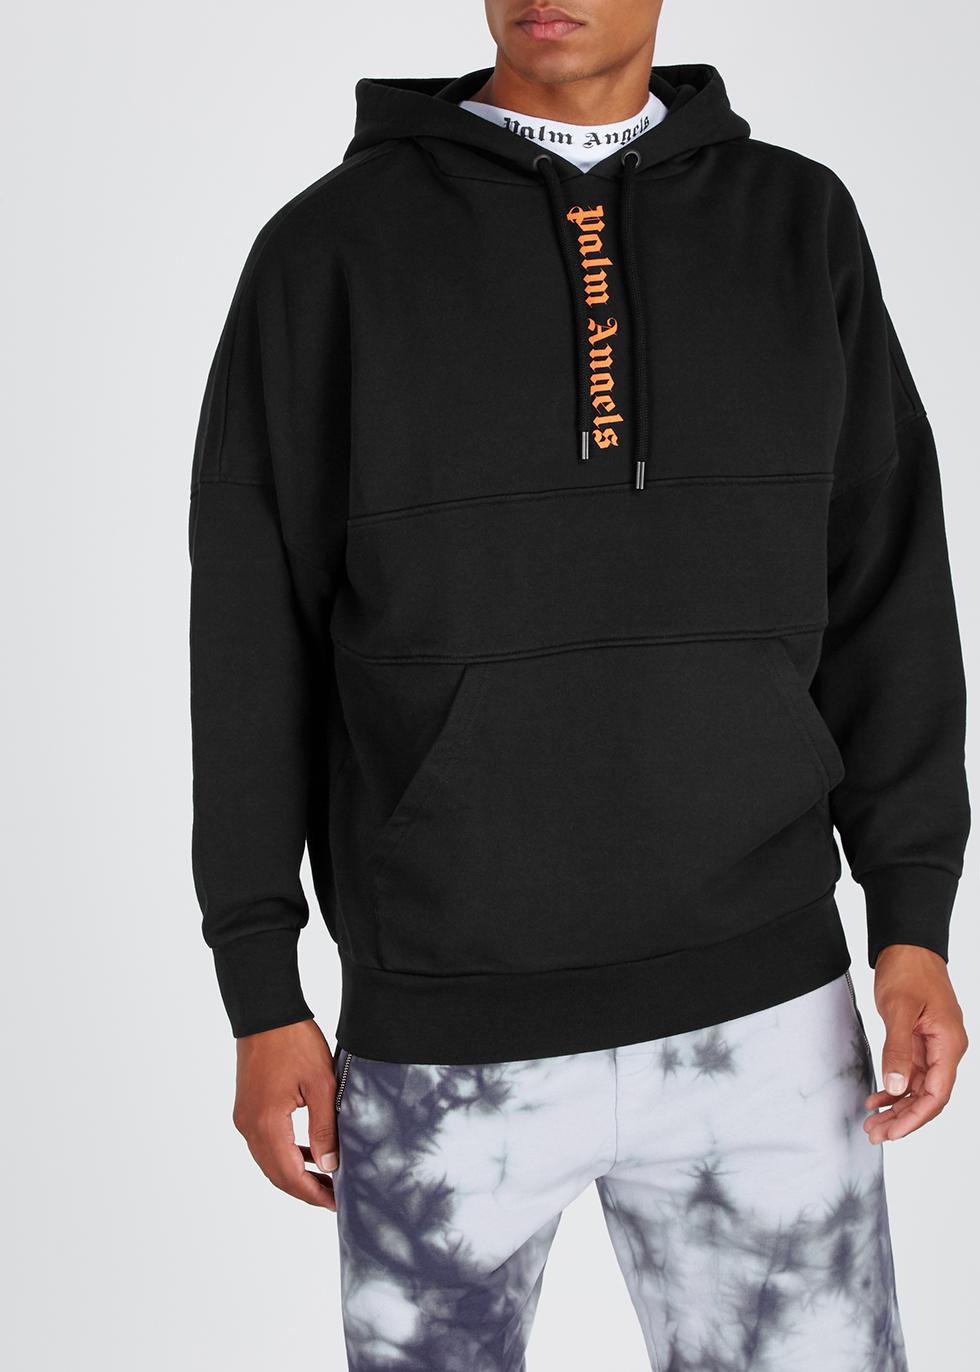 Black logo cotton sweatshirt - Palm Angels